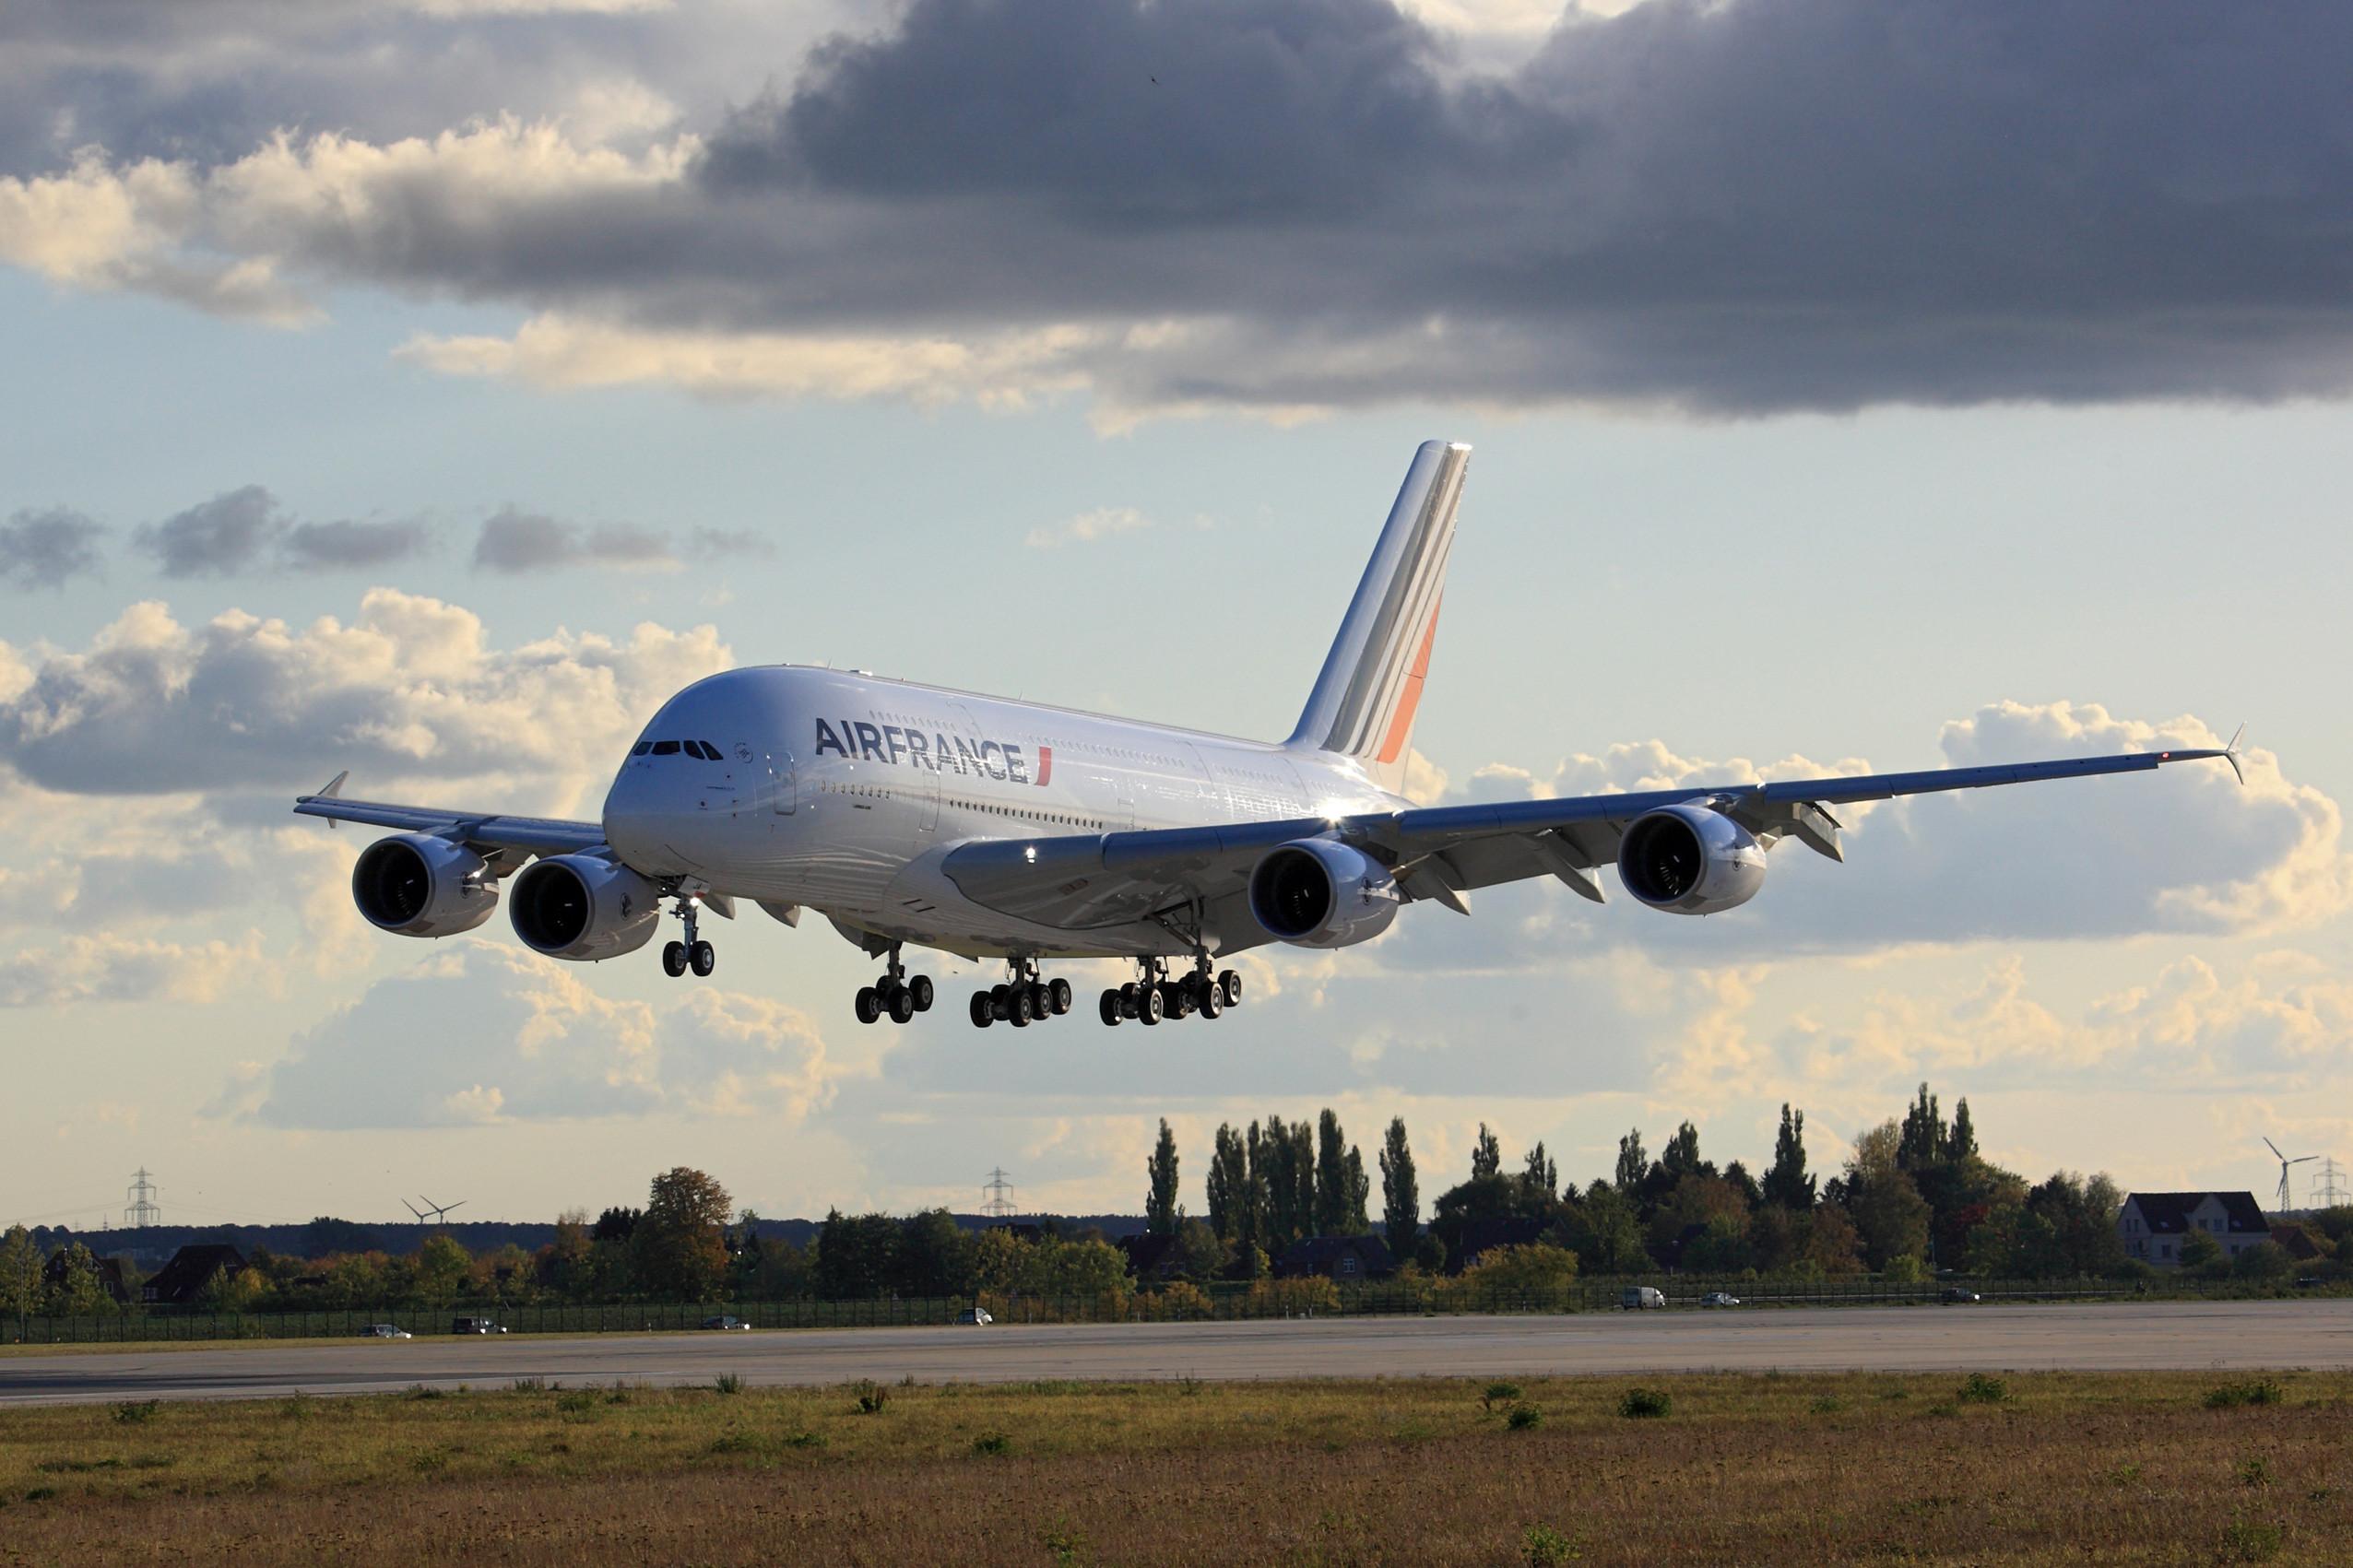 Air France Airbus A380-800 Landing Gear Retracted Aircraft Wallpaper 3717